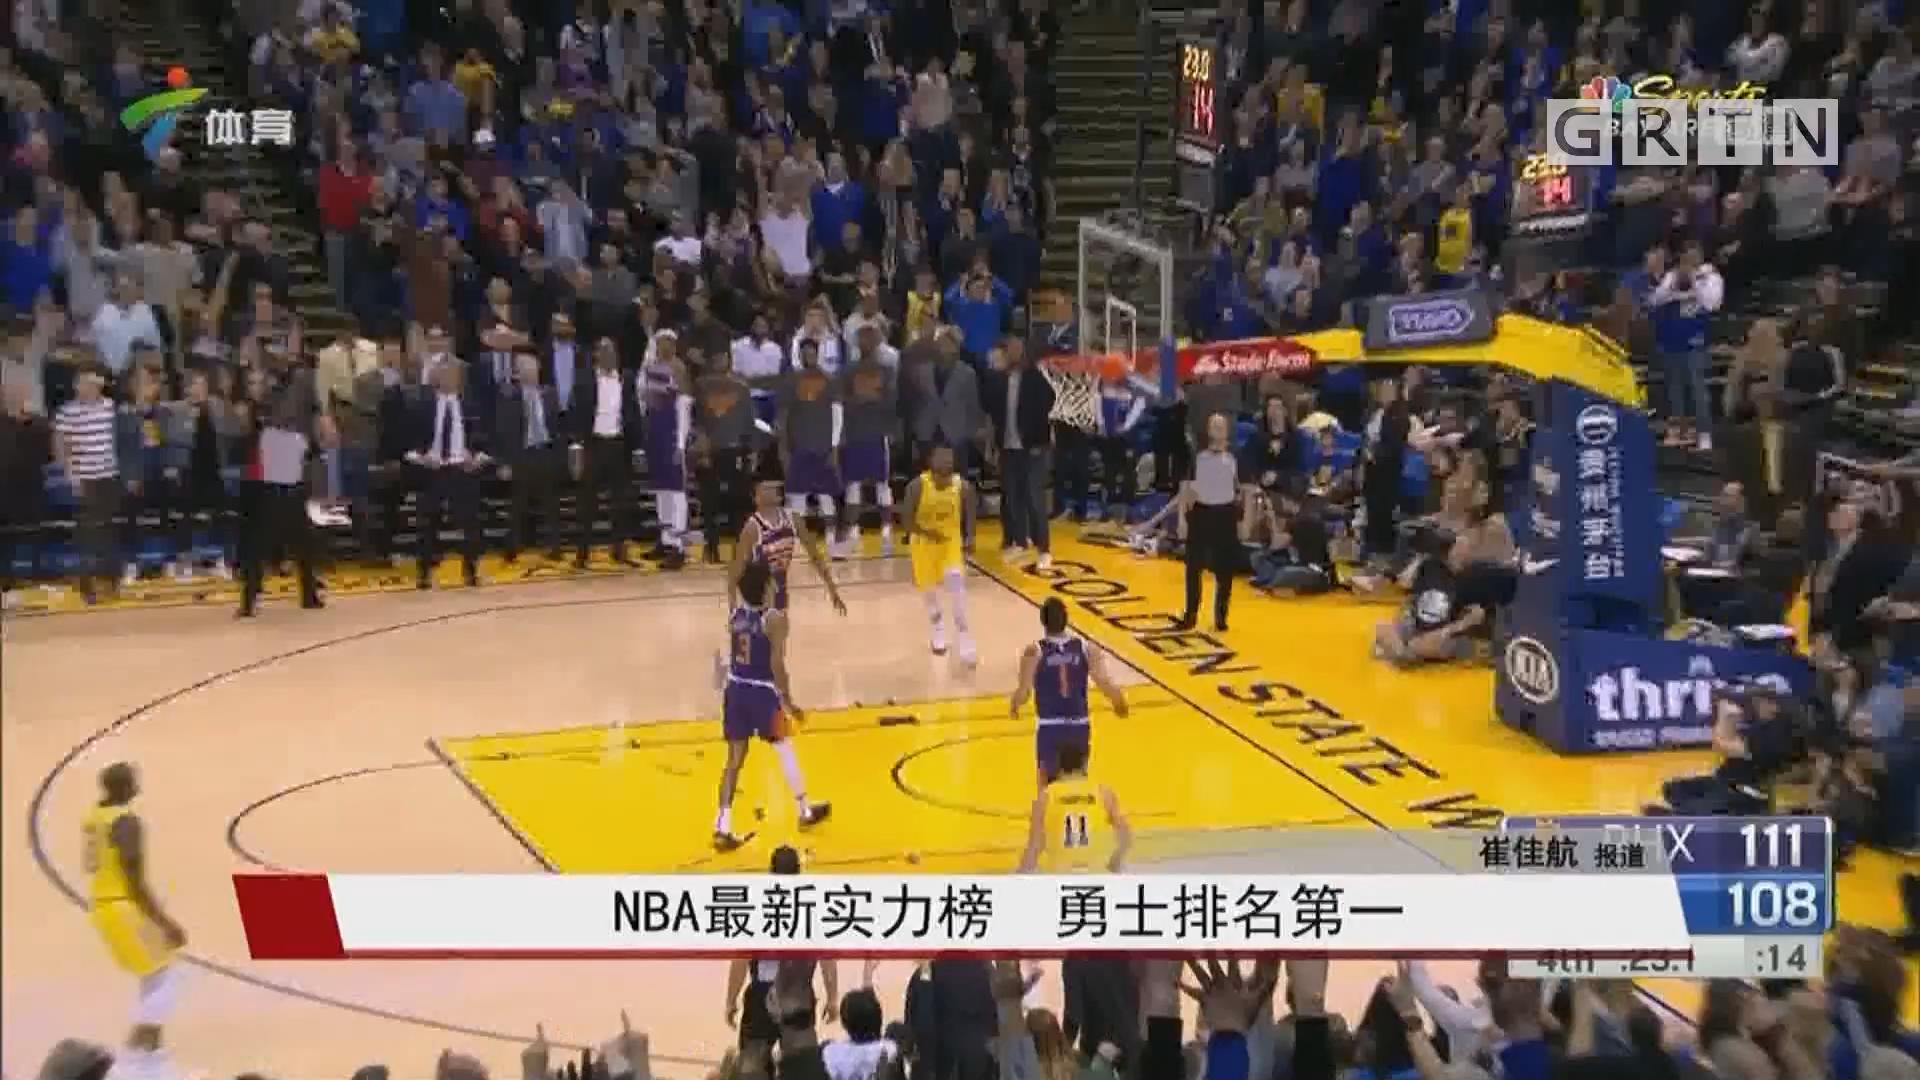 NBA最新实力榜 勇士排名第一